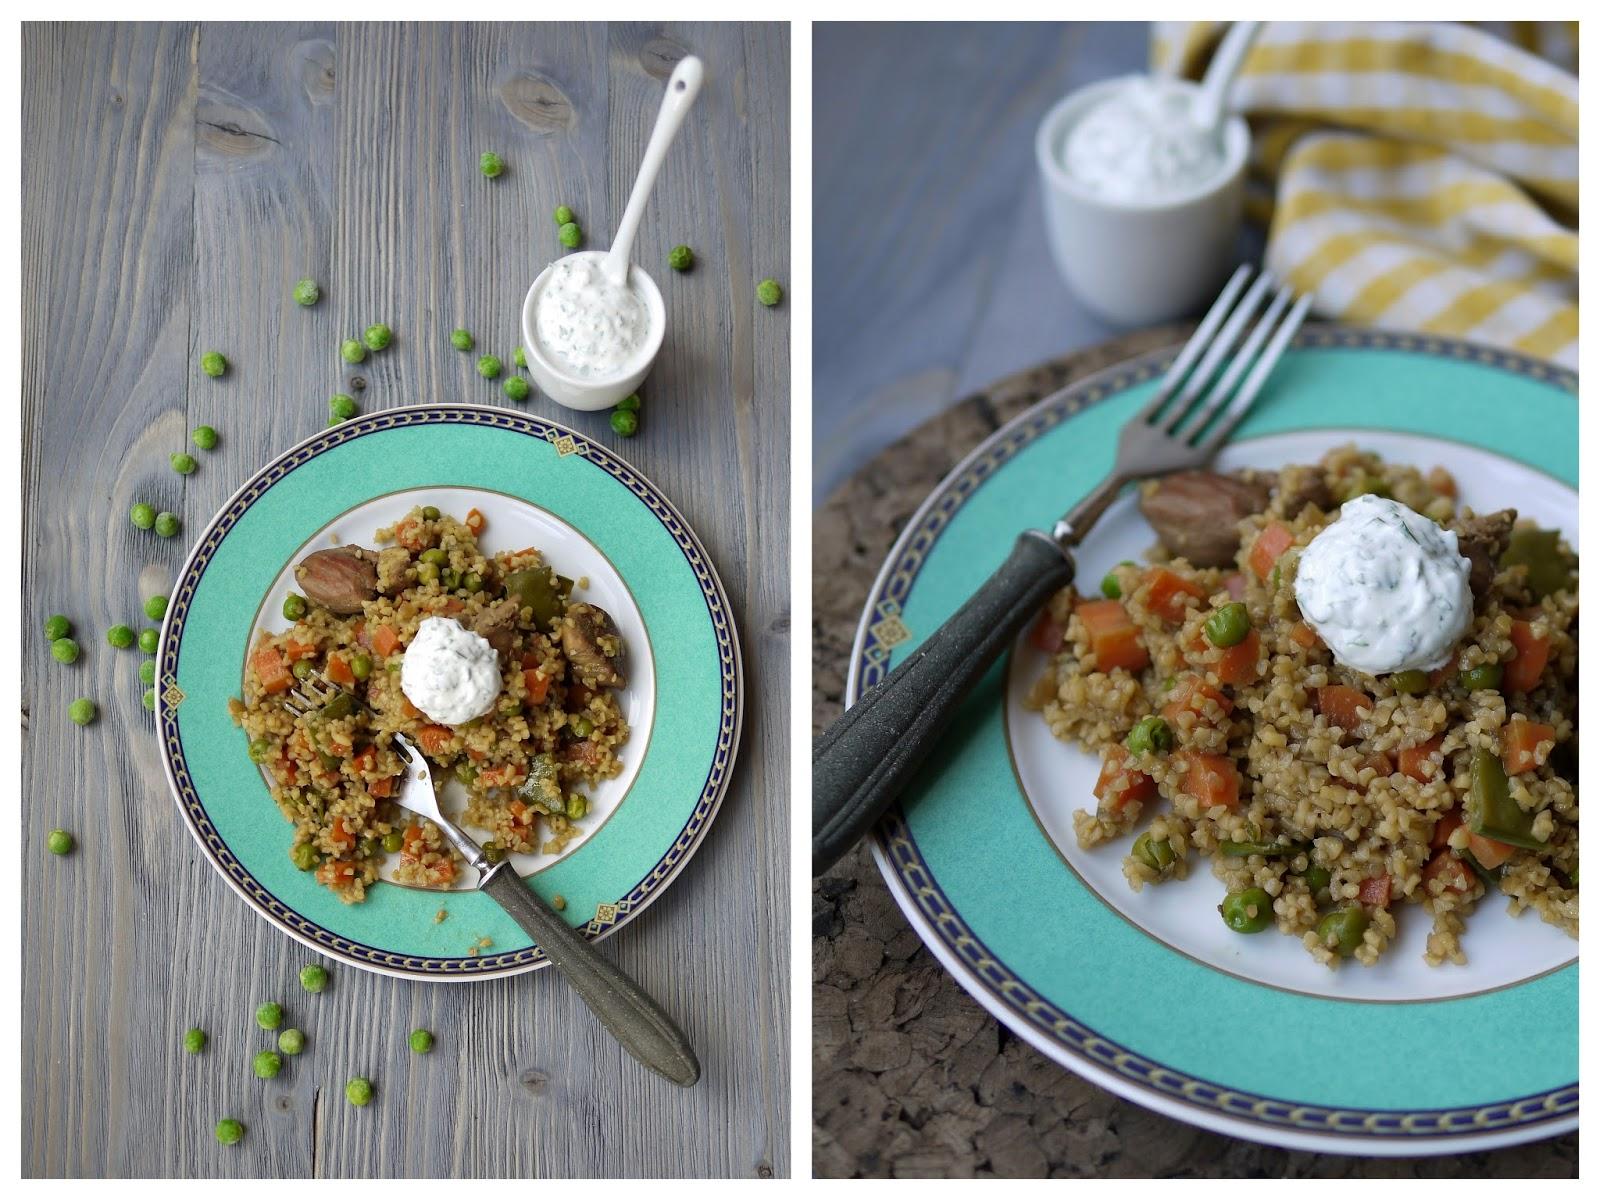 Bulgur-Hähnchen-Pfanne | Rezept | Kochen | Essen